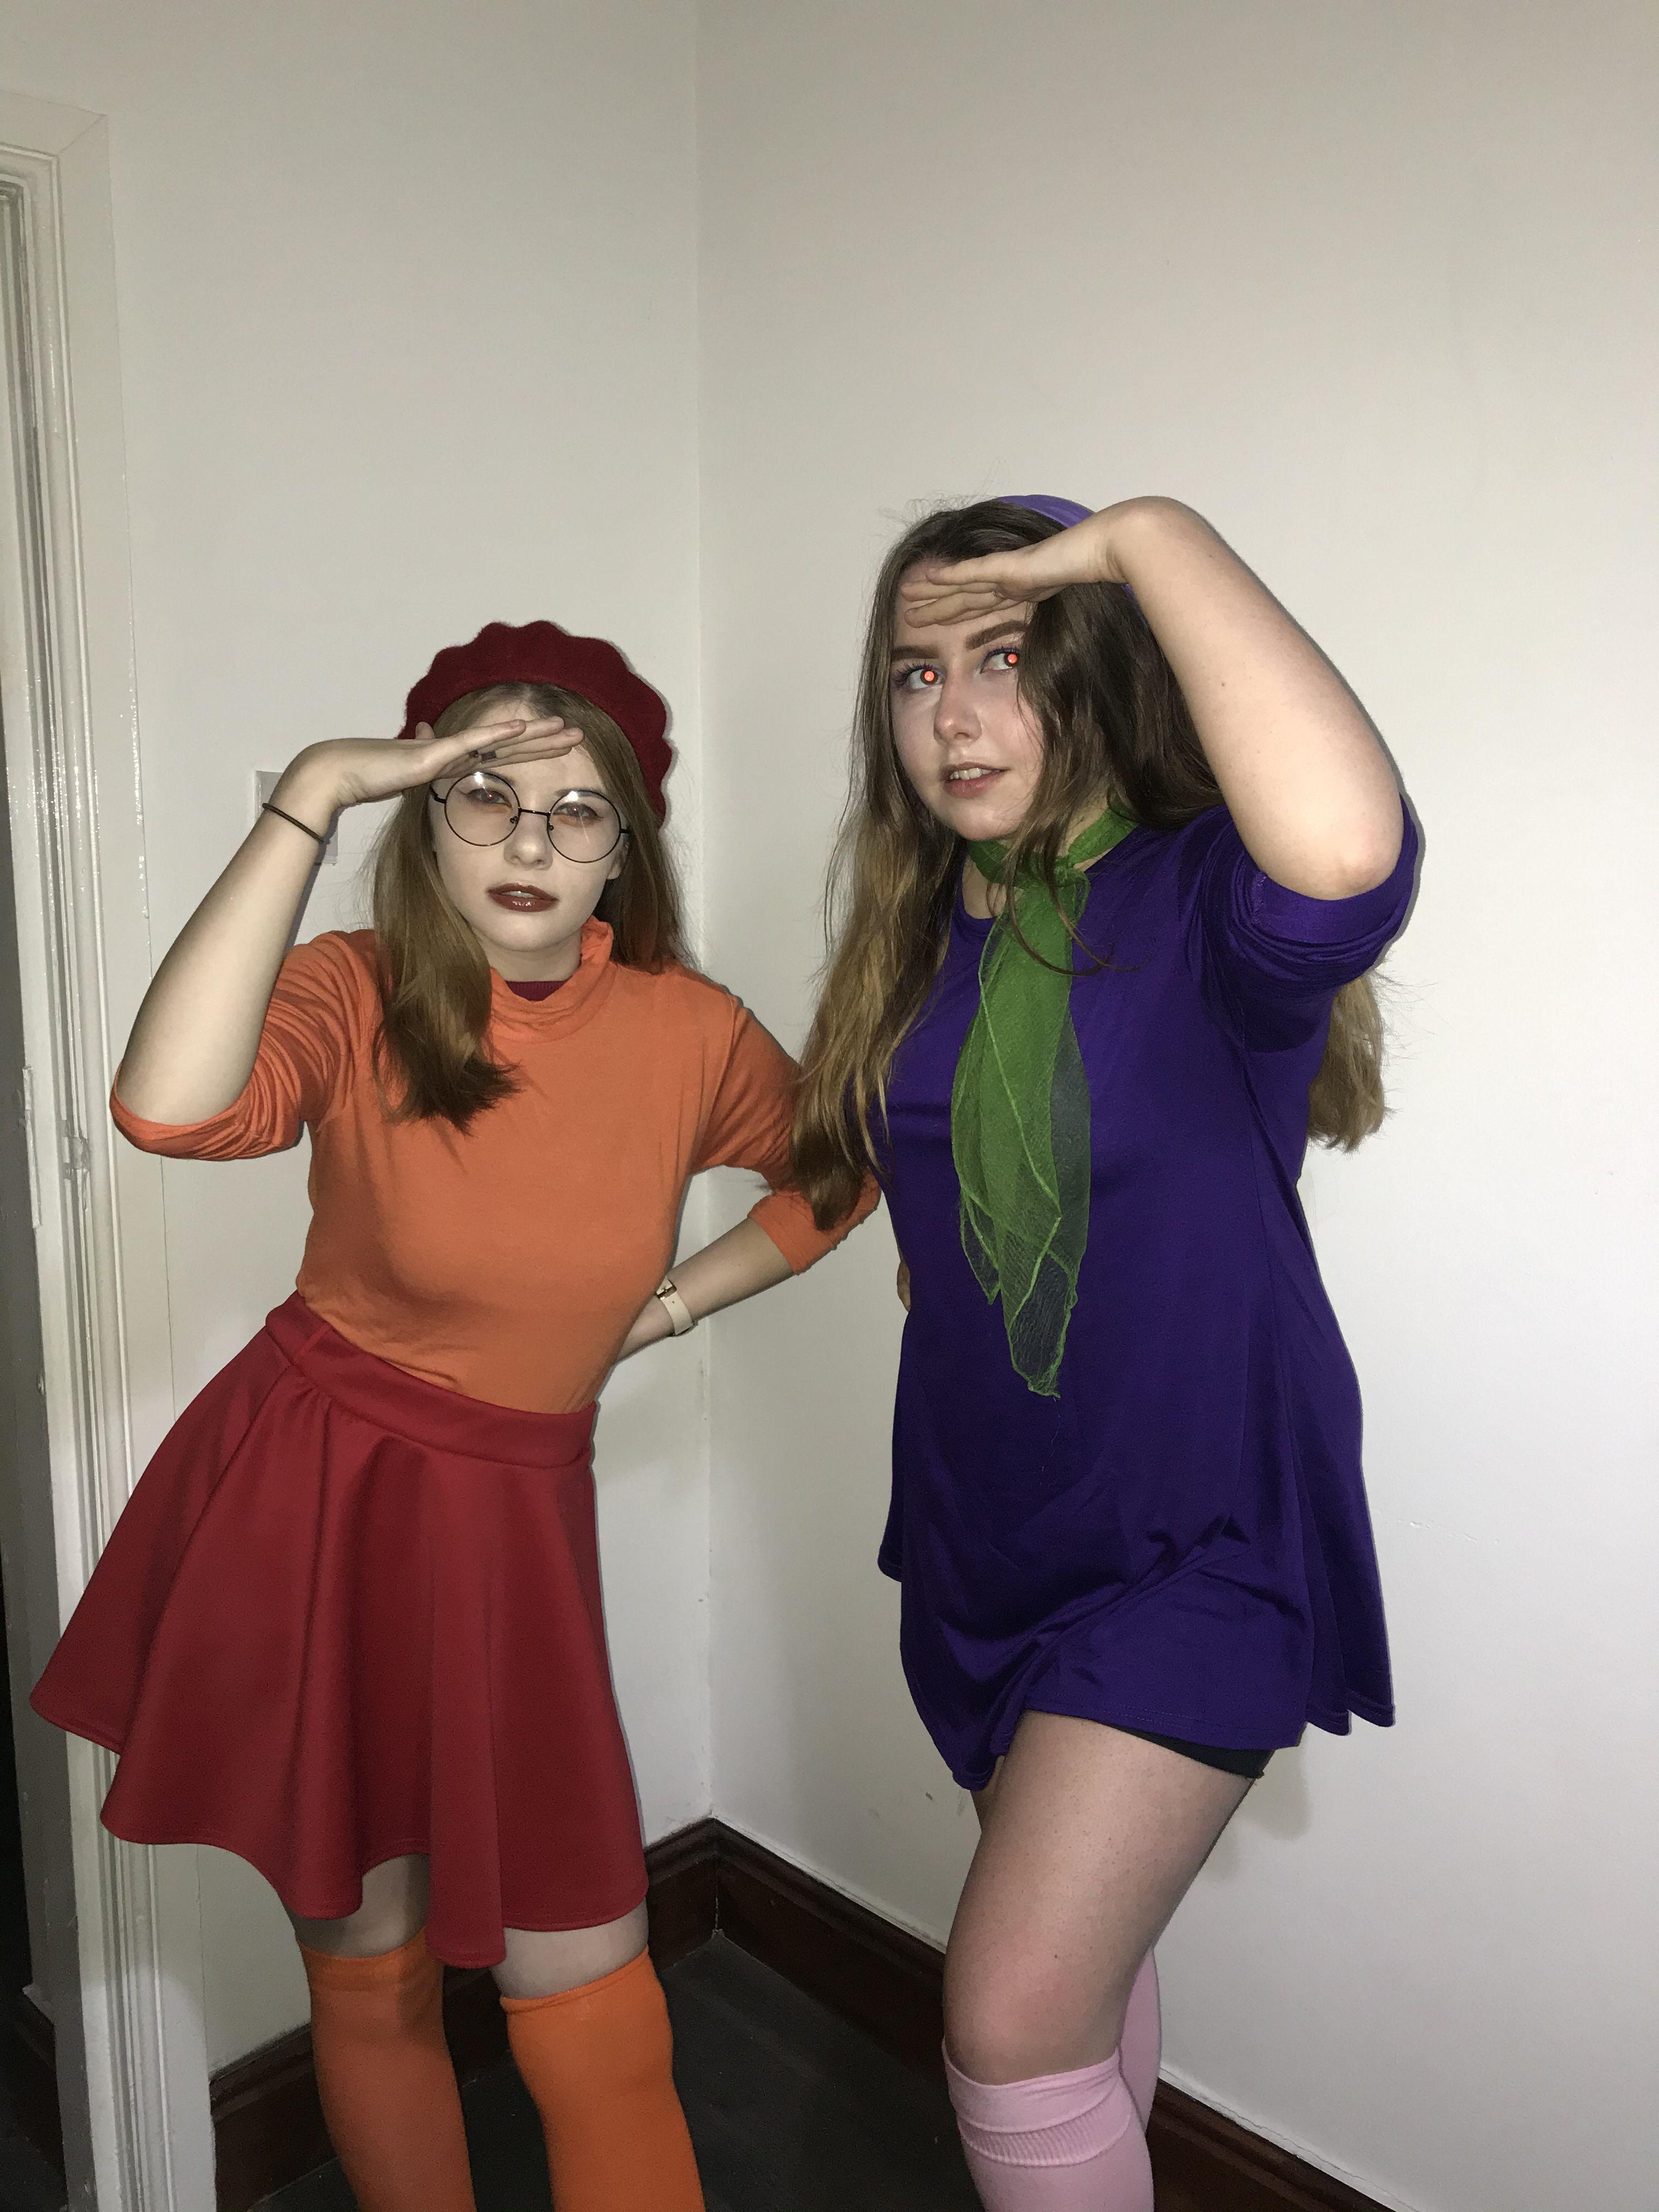 Daphne And Velma Halloween Costume Velmaanddaphne Daphne Costume Velma Costume Velma Halloween Costume